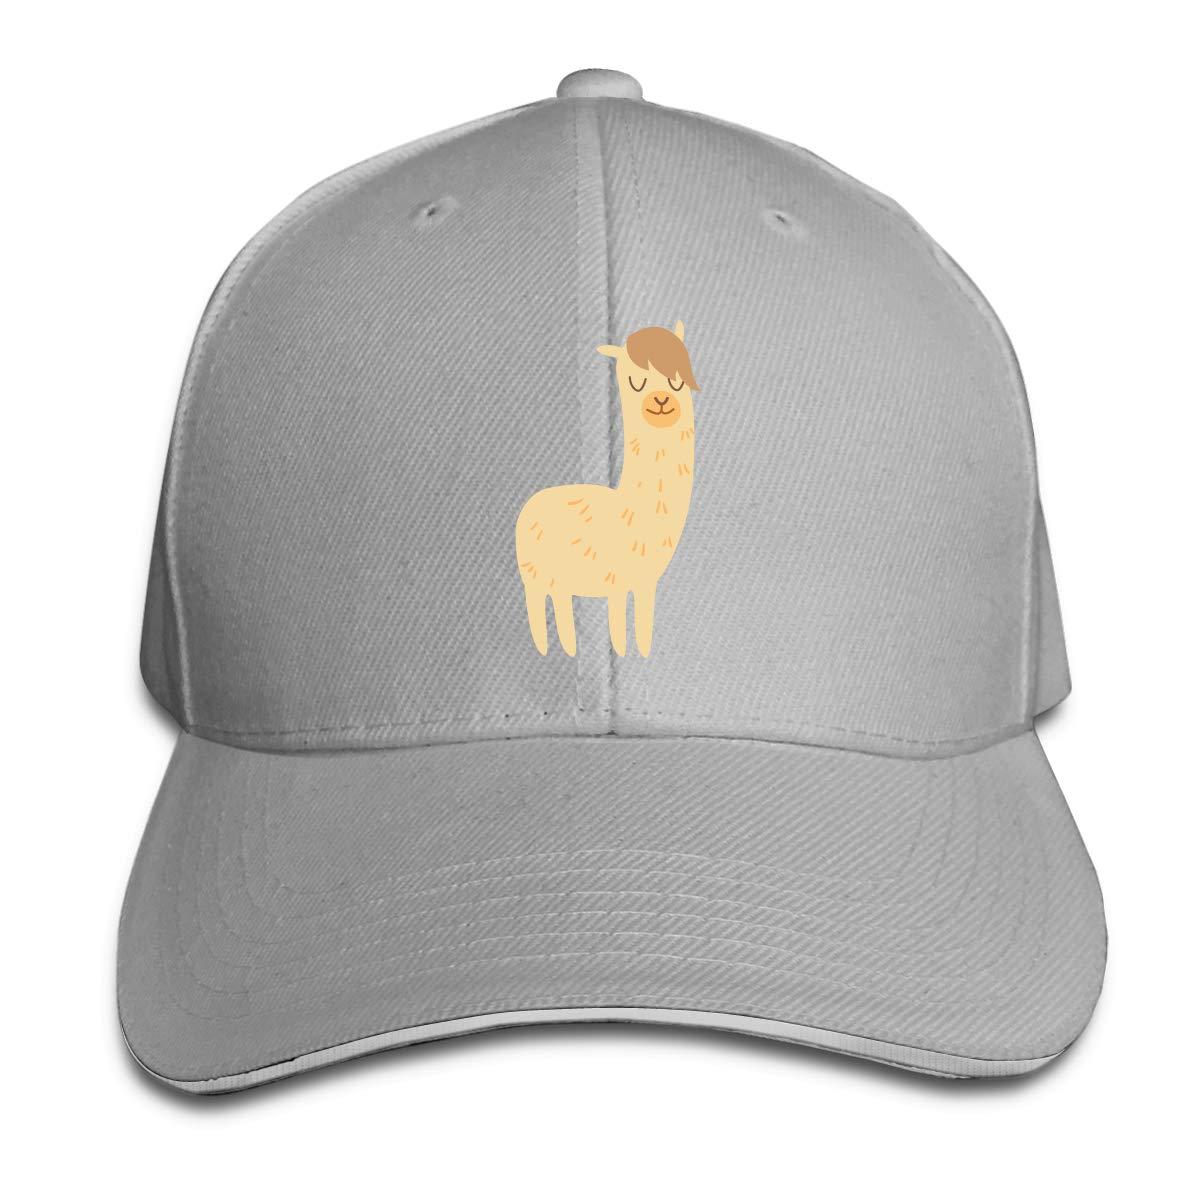 WFIRE Adult Baseball Caps Cute Llama Alpaca Custom Adjustable Sandwich Cap Casquette Hats